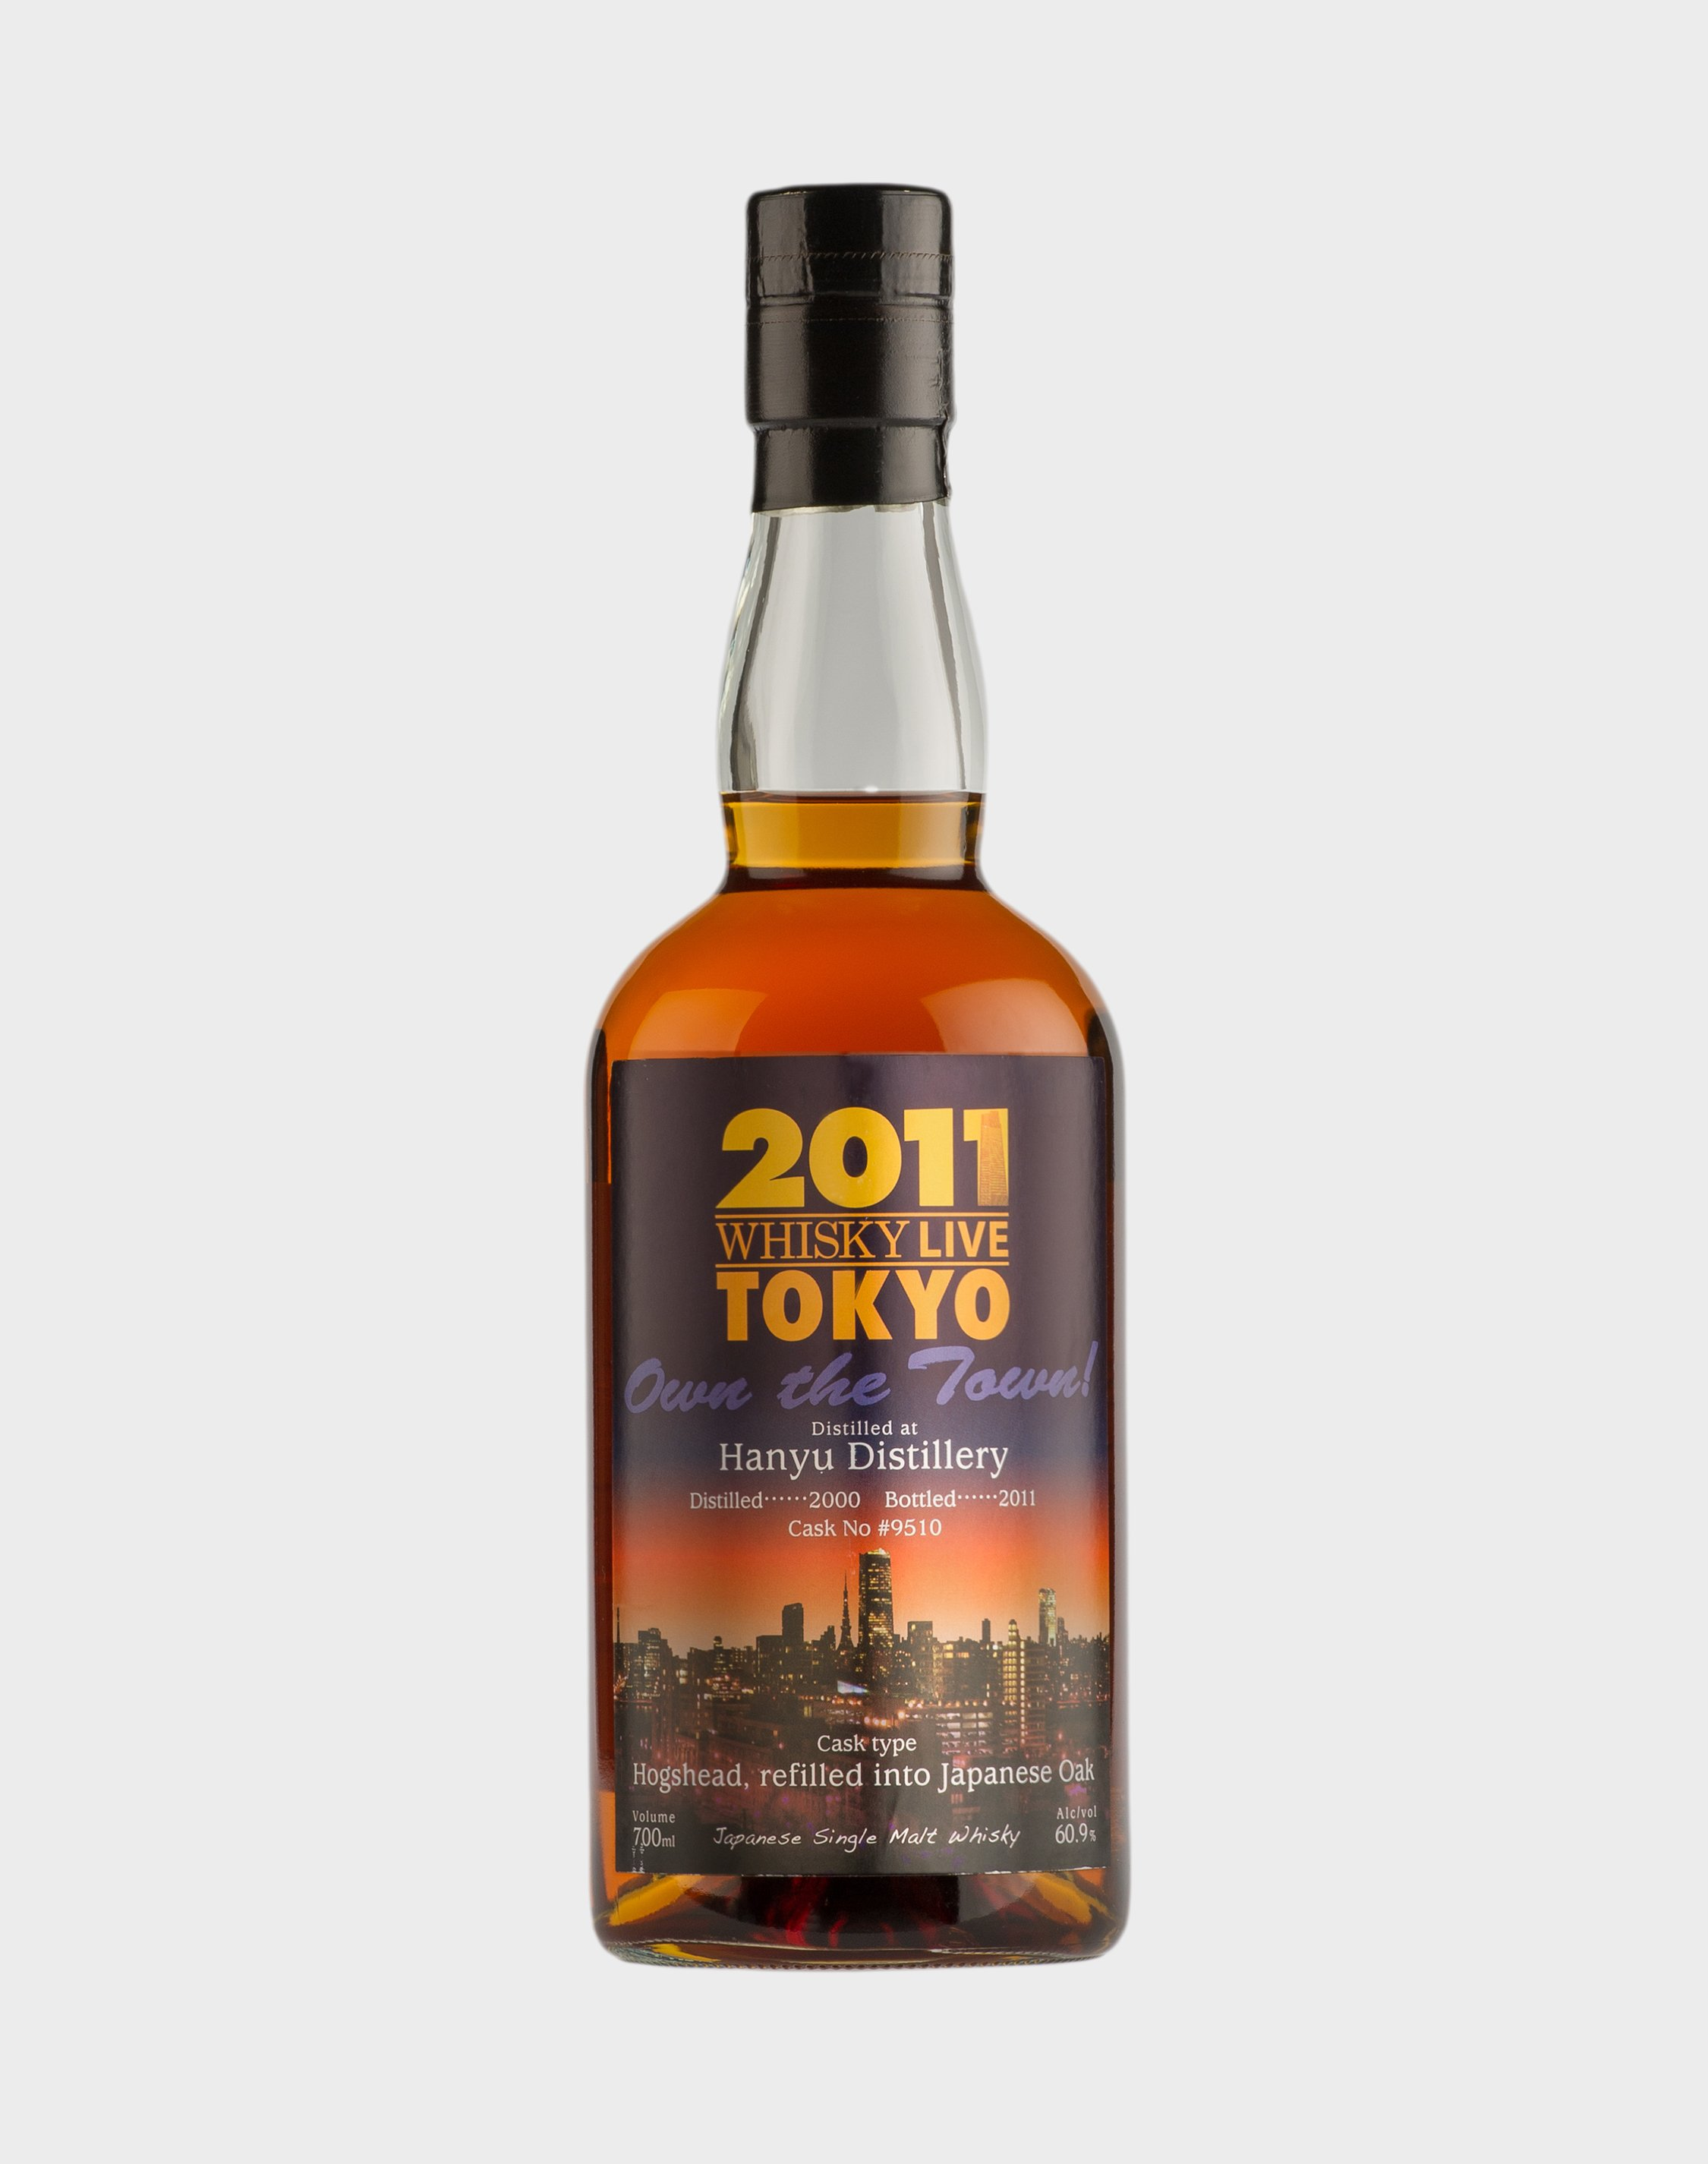 Hanyu 2011 Whisky Live Tokyo